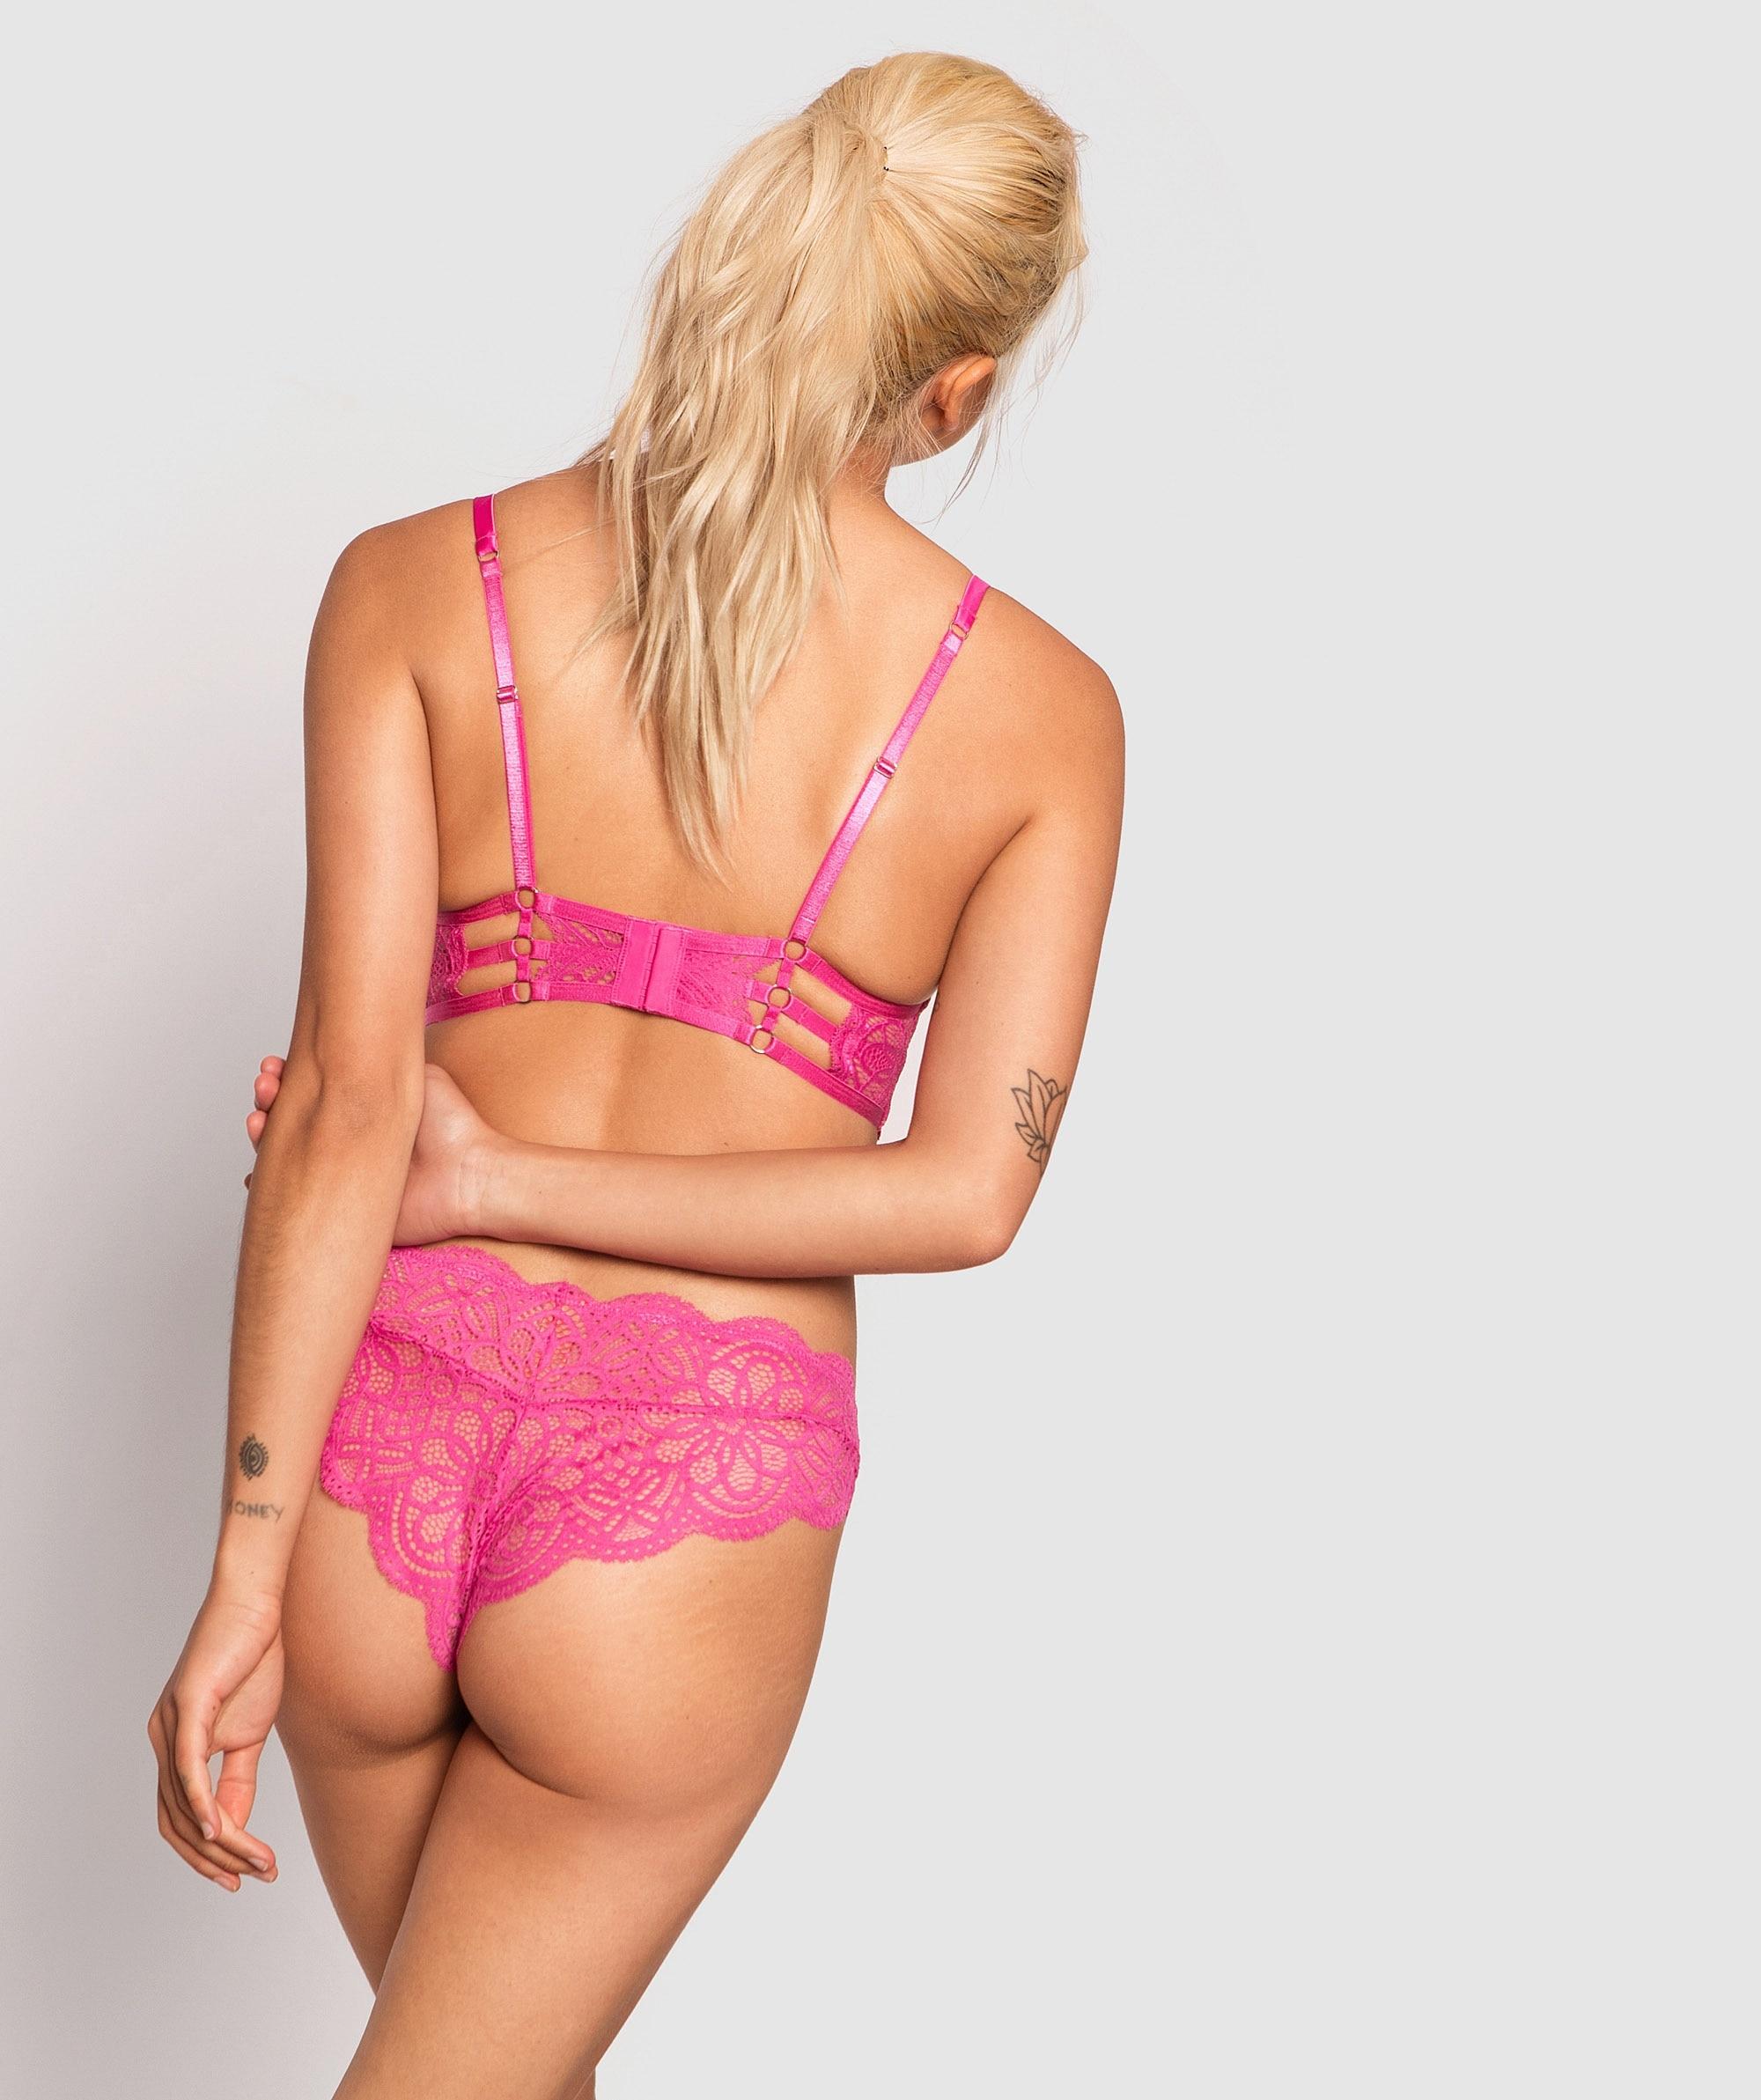 Bluma Brazilian Knicker - Pink